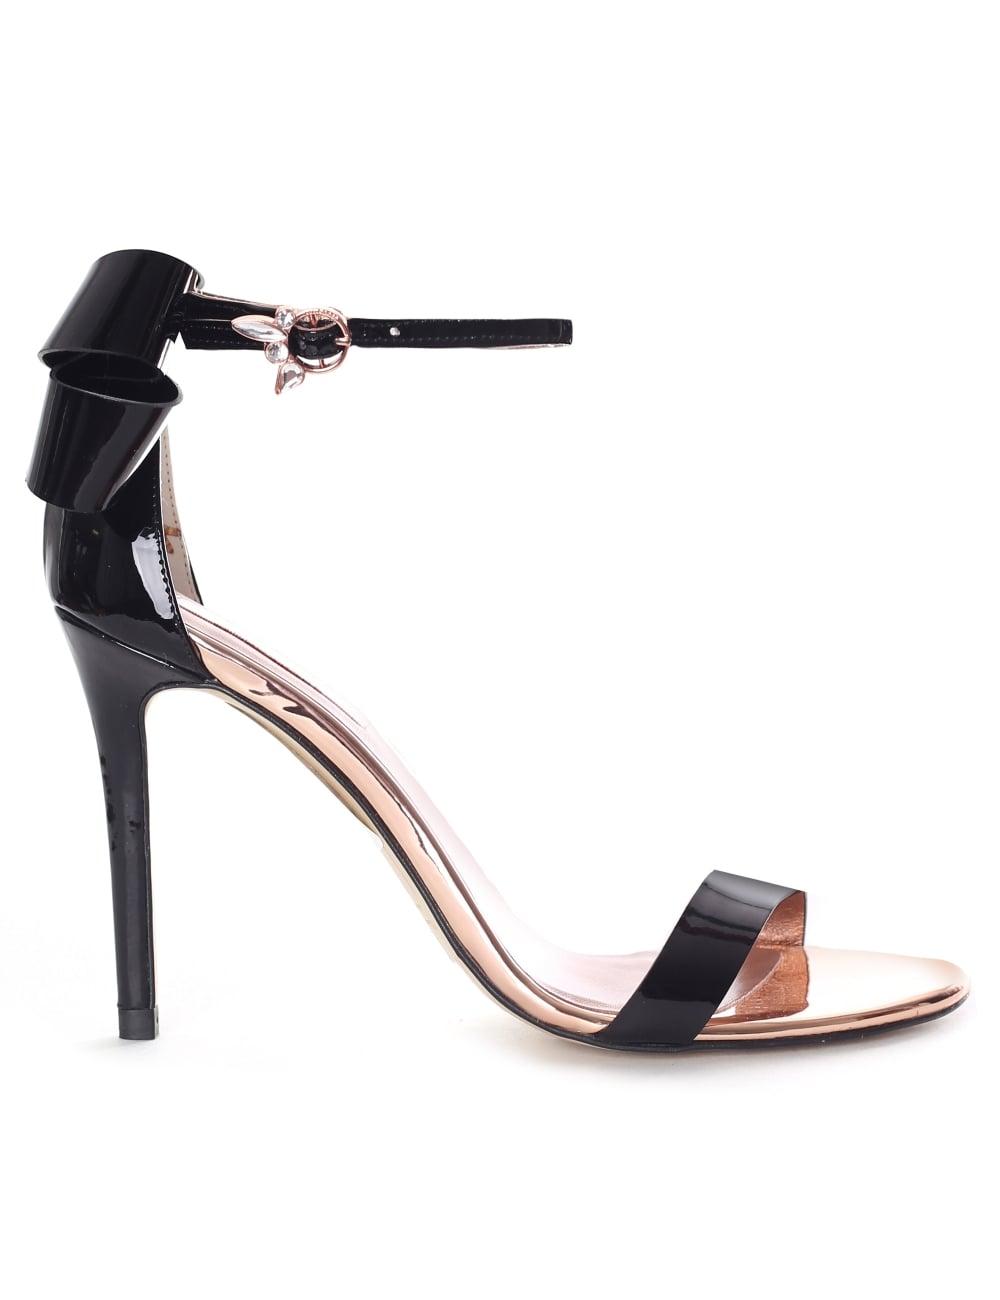 e8e7b8c1ef2 Ted Baker Sandalo Patent Women s Bow Back Heeled Sandals